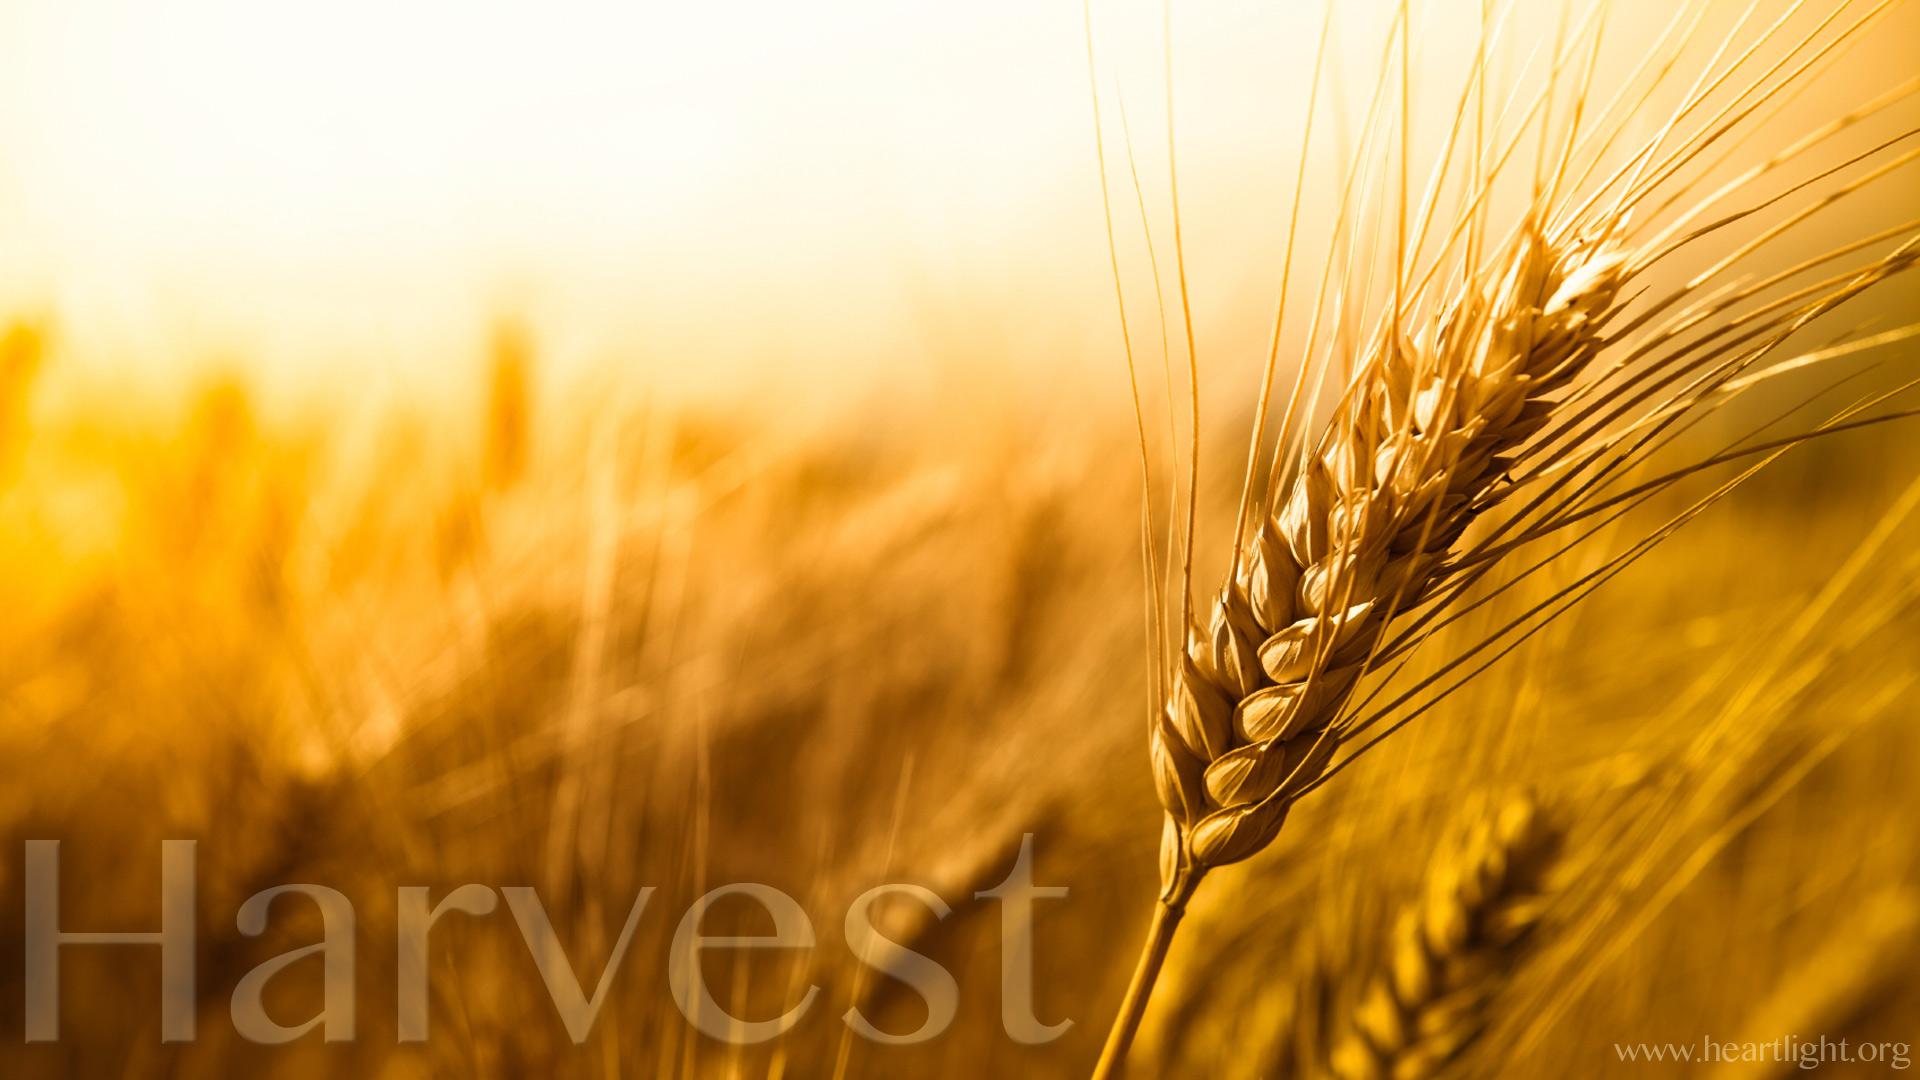 Quot Harvest Quot Powerpoint Background Of Matthew 9 37 38